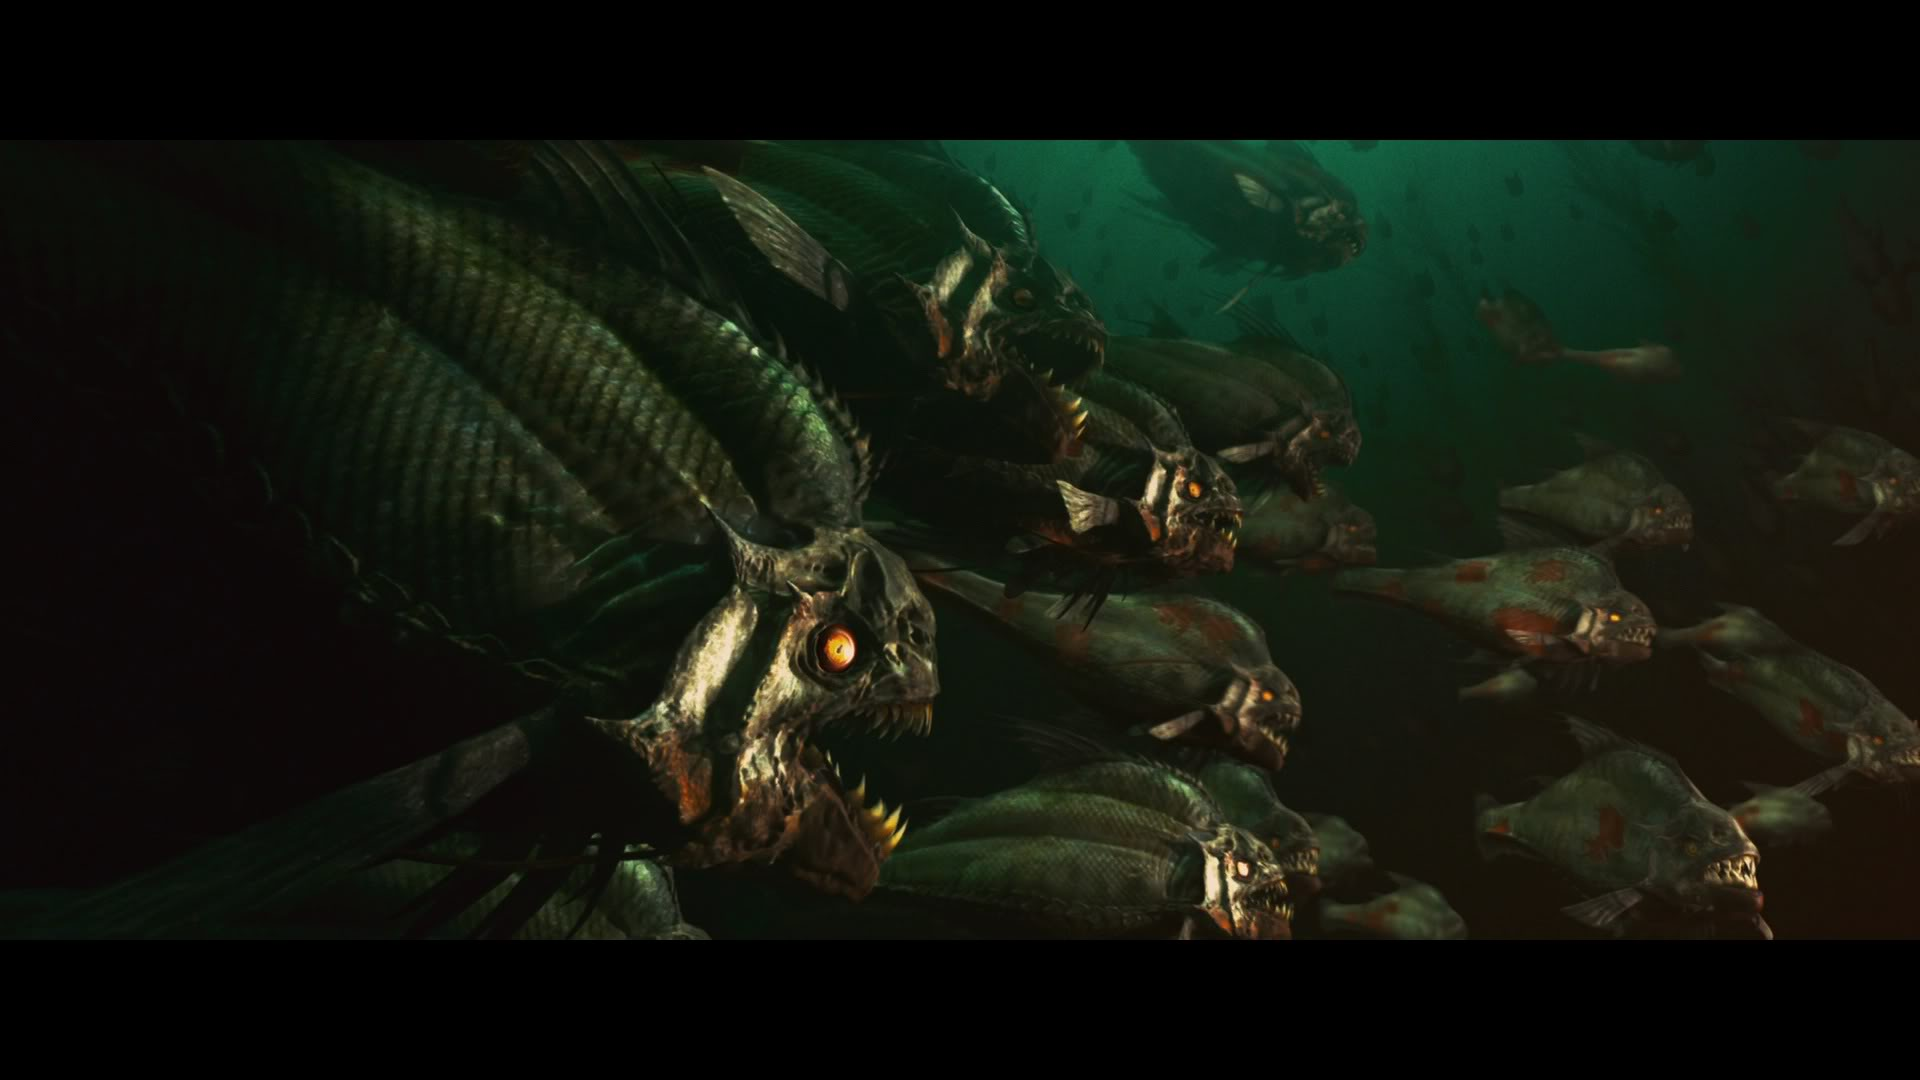 Piranha, Foto: highdefnews.blogspot.com